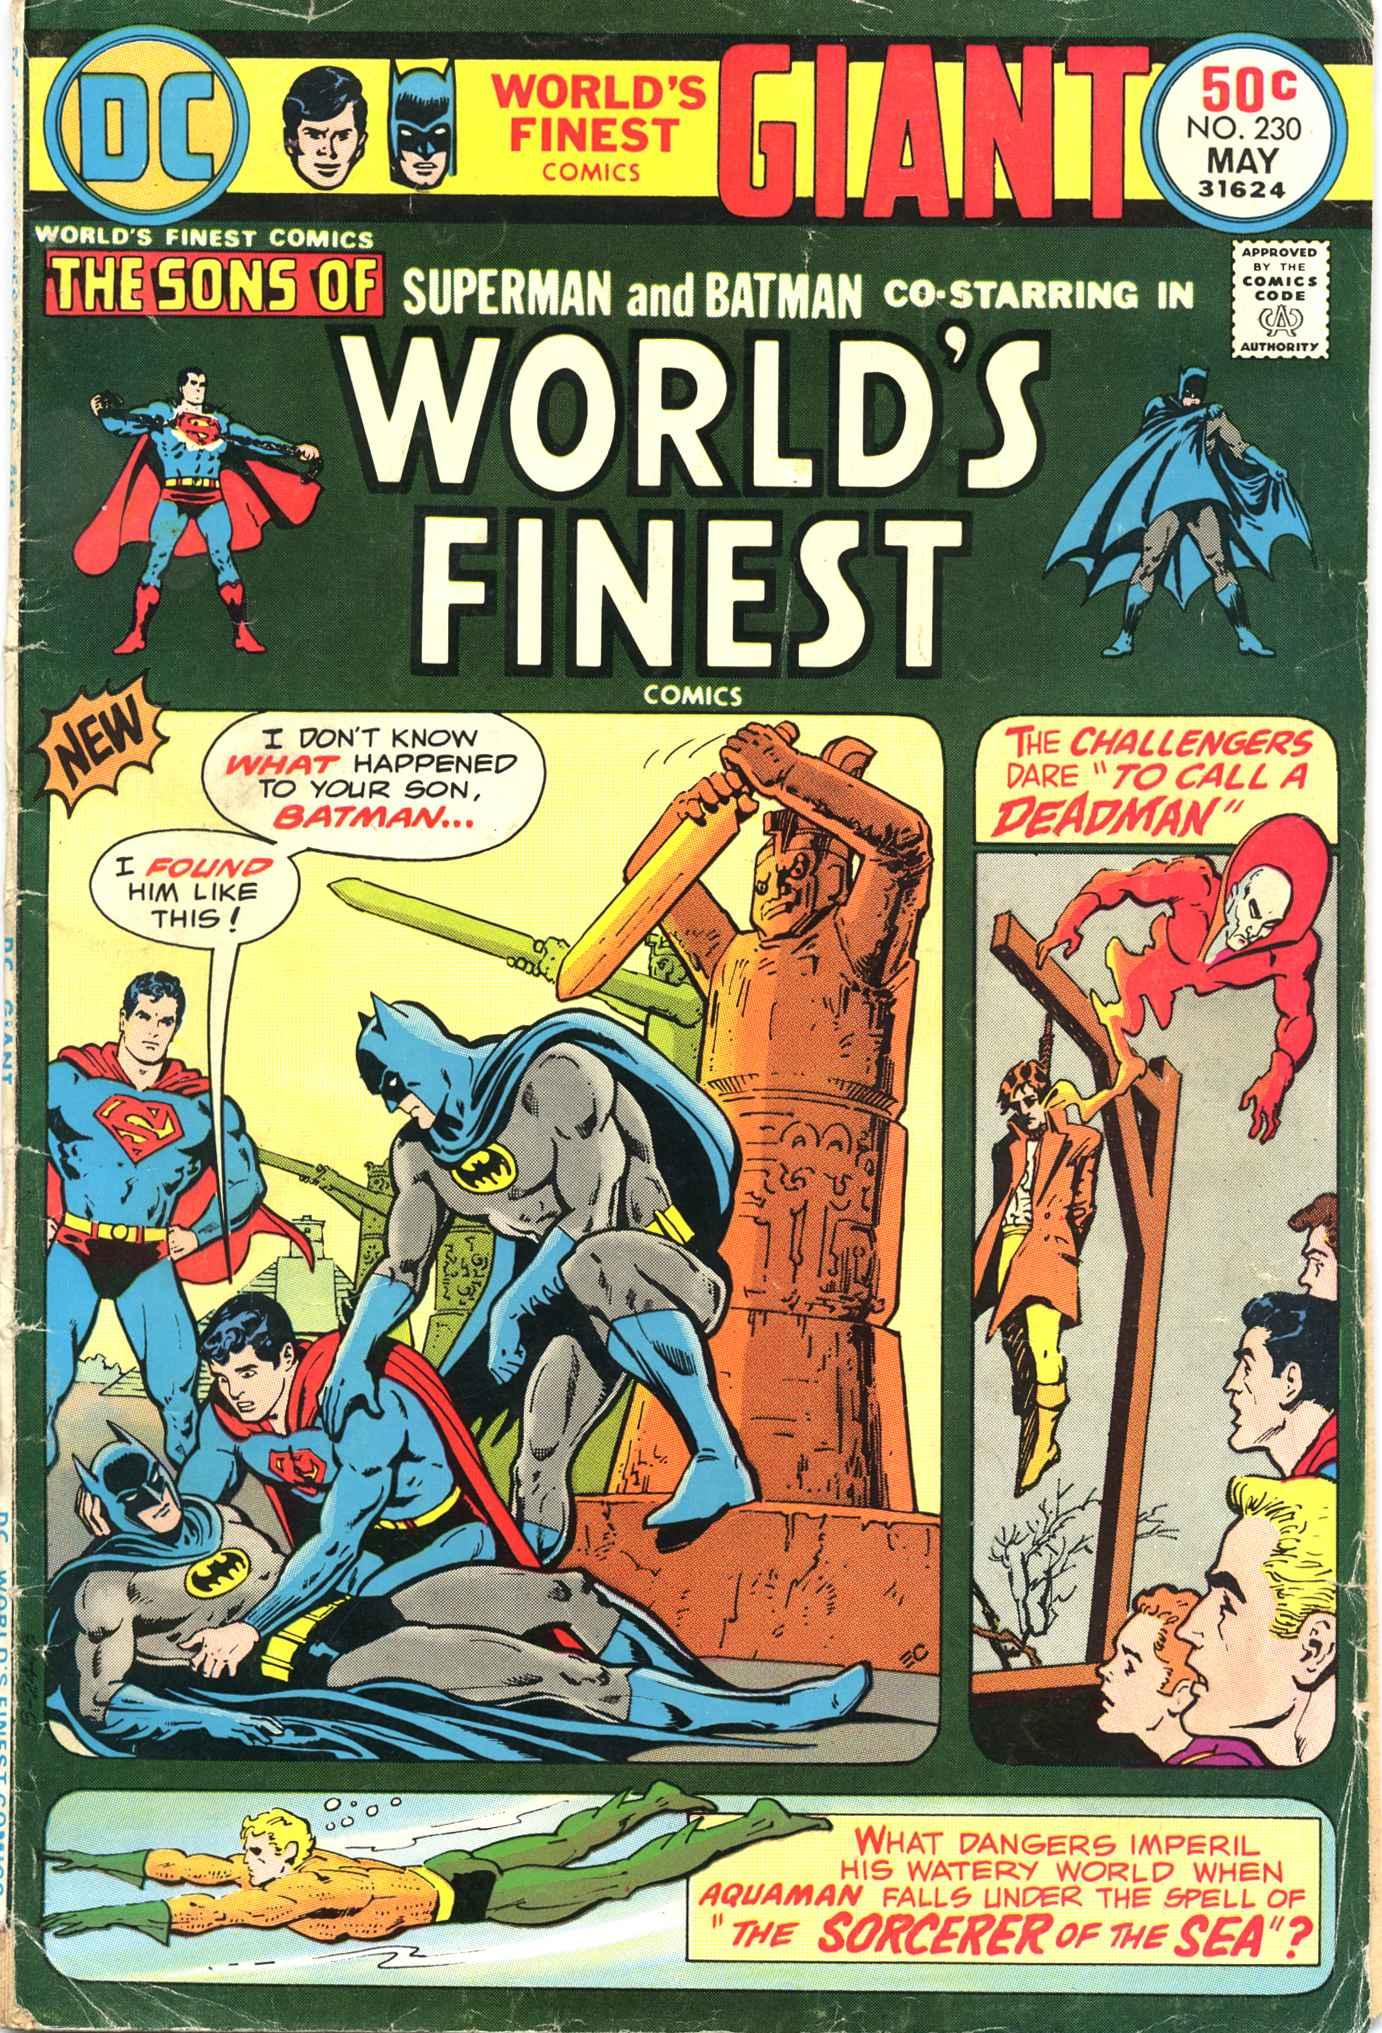 Read online World's Finest Comics comic -  Issue #230 - 1